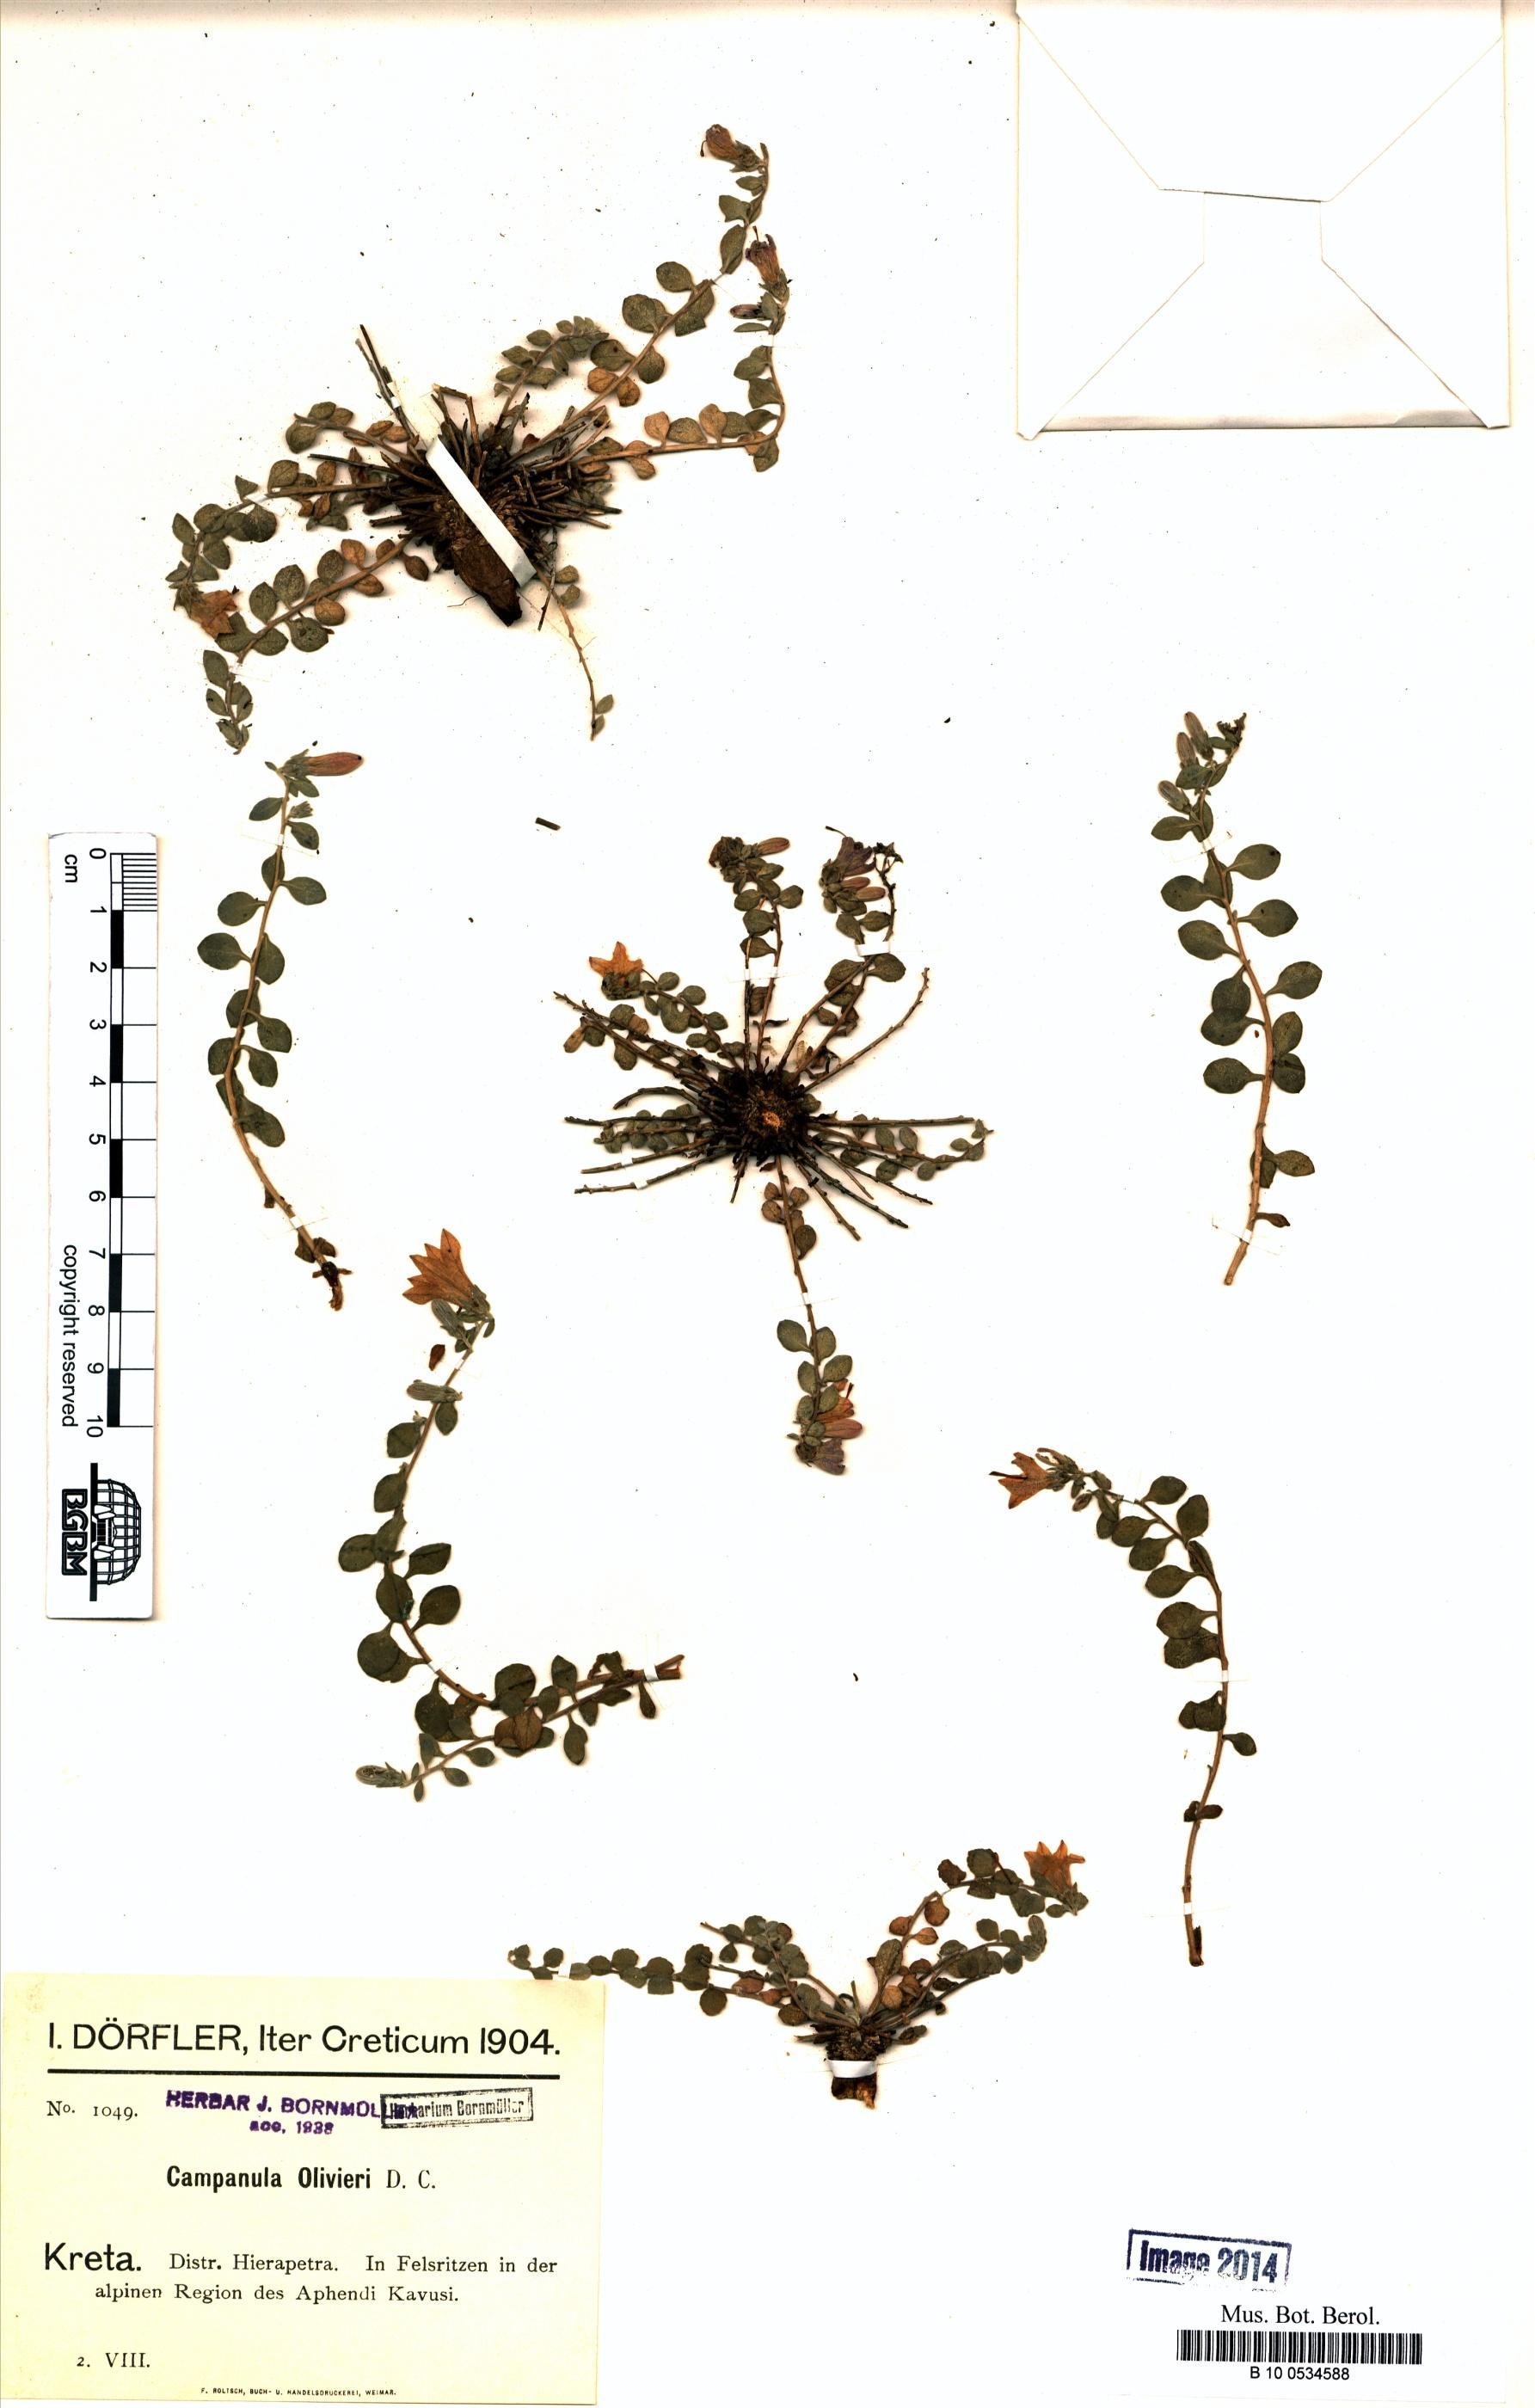 http://ww2.bgbm.org/herbarium/images/B/10/05/34/58/B_10_0534588.jpg